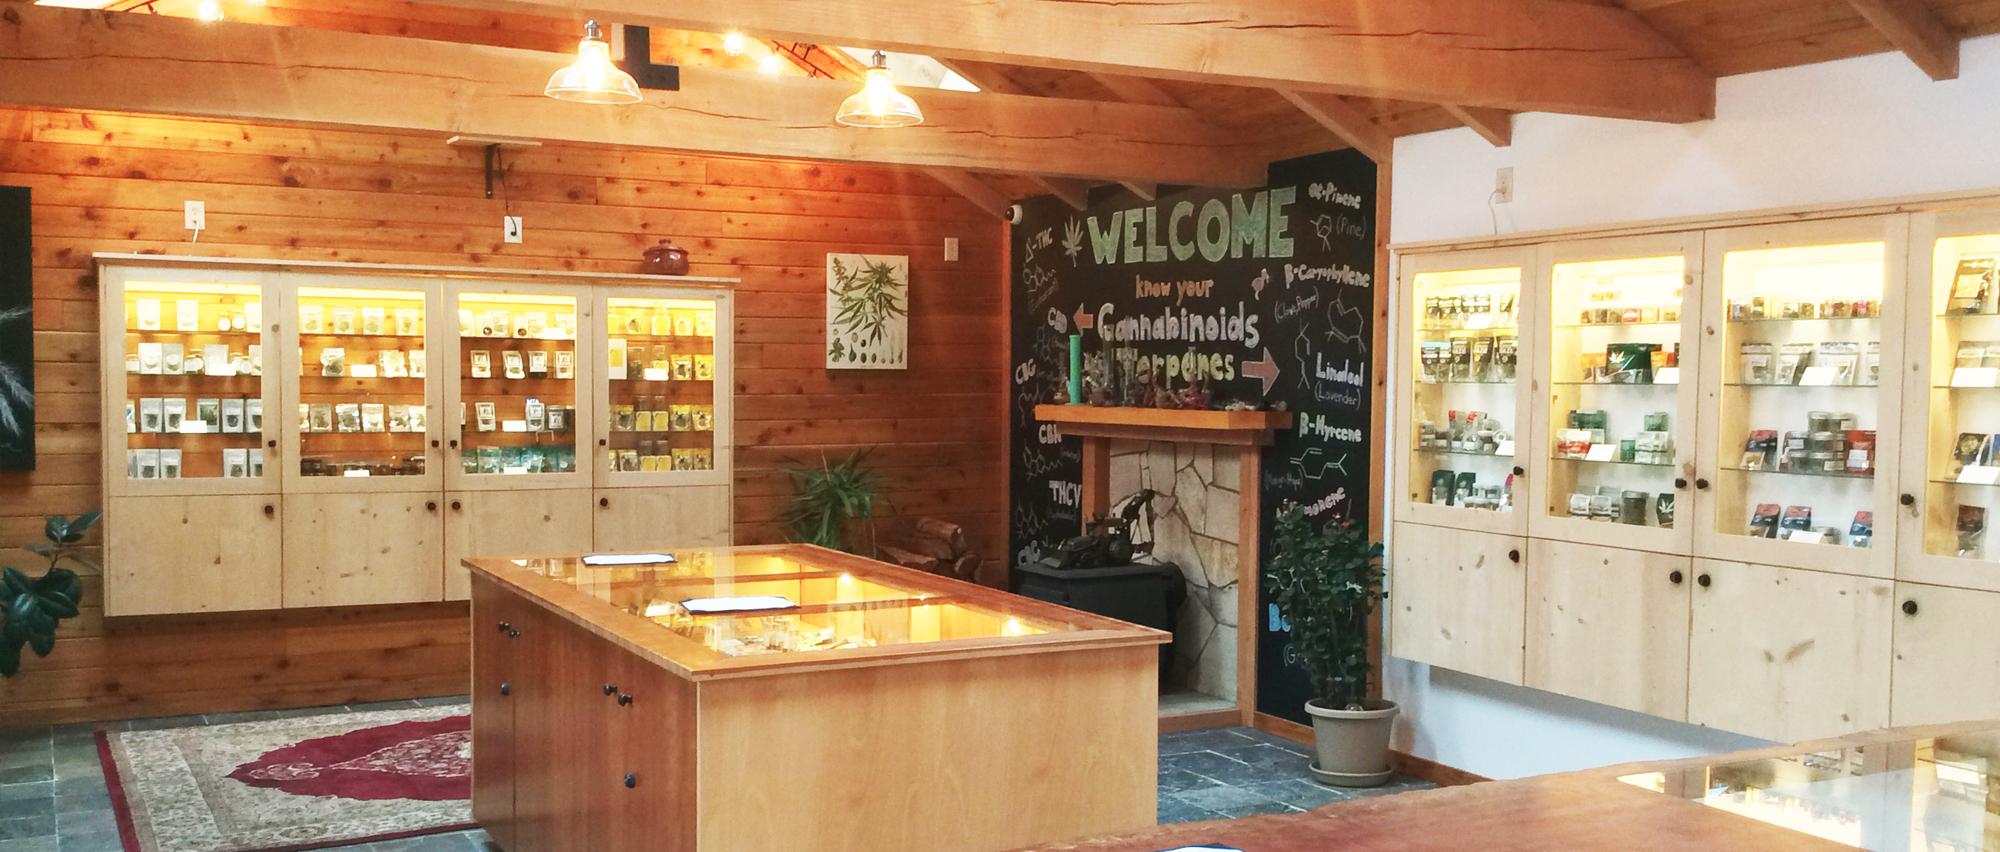 Photo c/o Chimacum Cannabis Co.